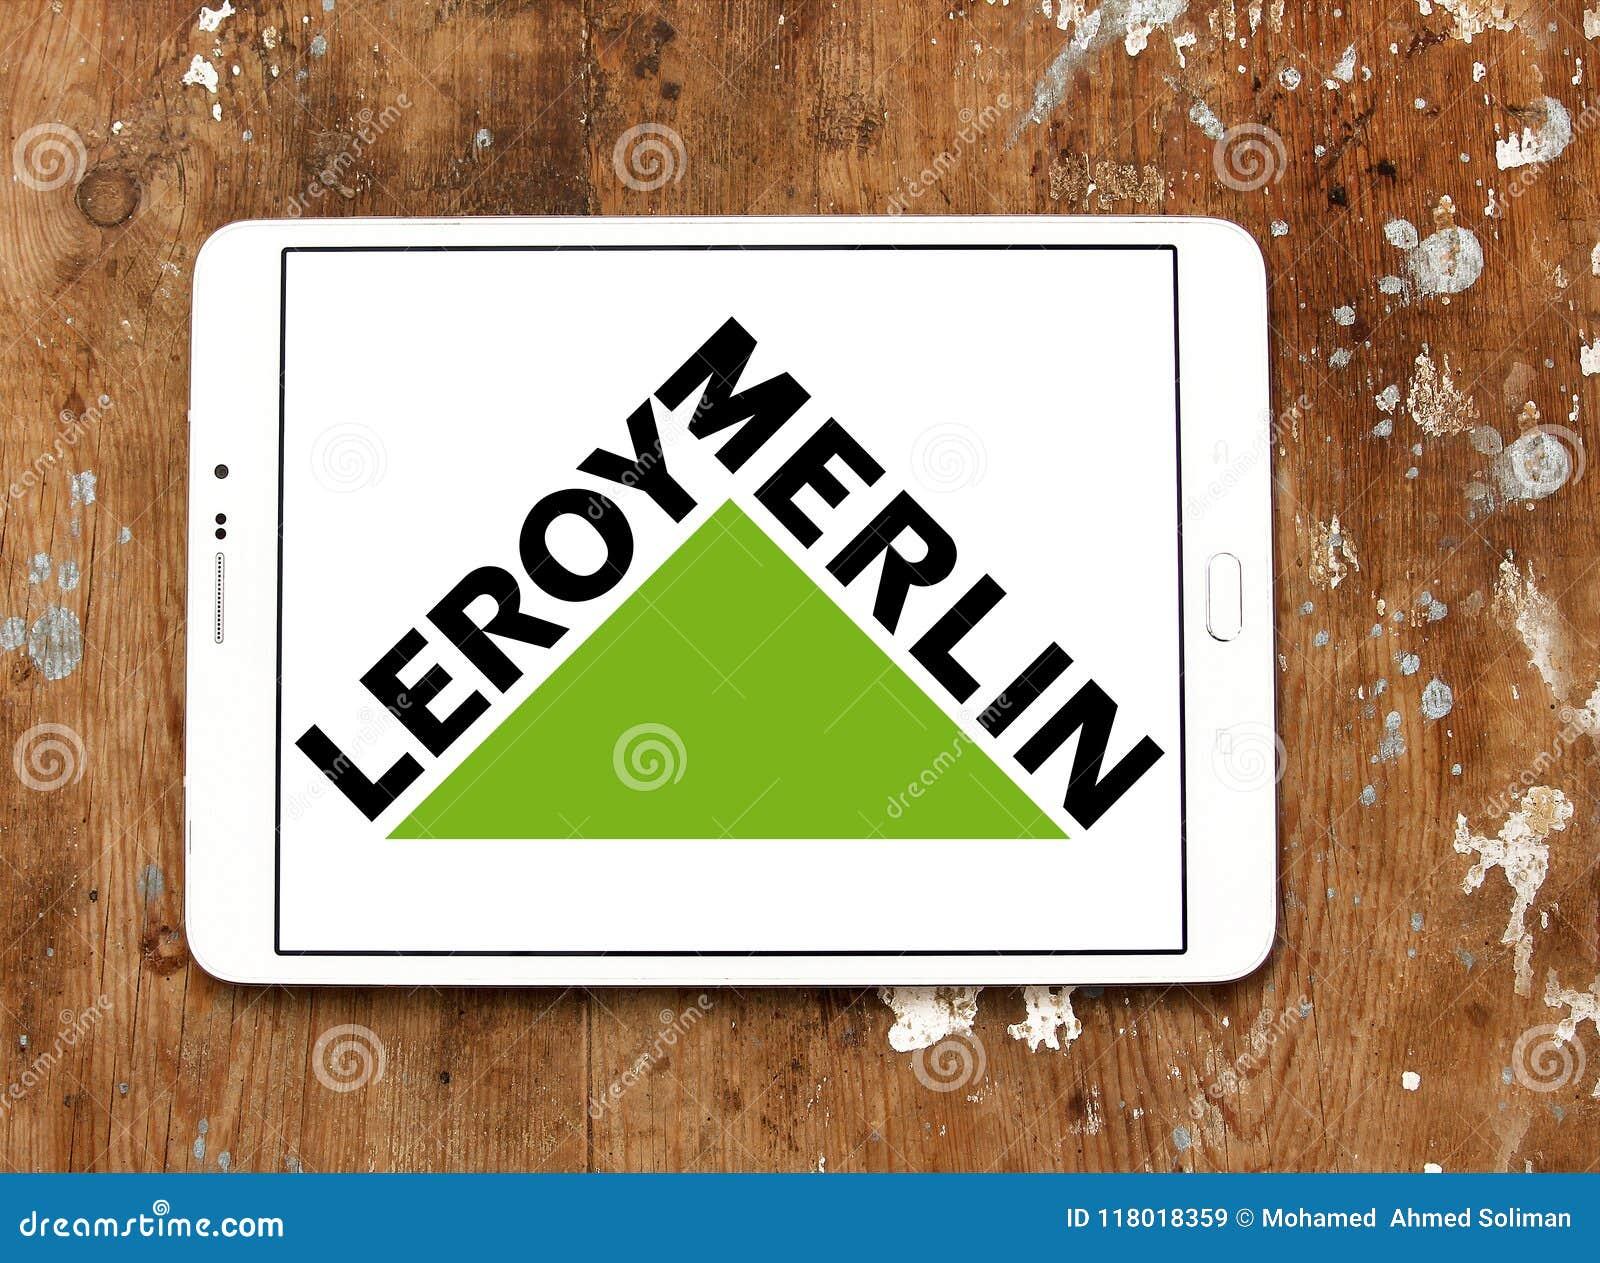 Leroy Merlin Retailer Logo Editorial Stock Image Image Of